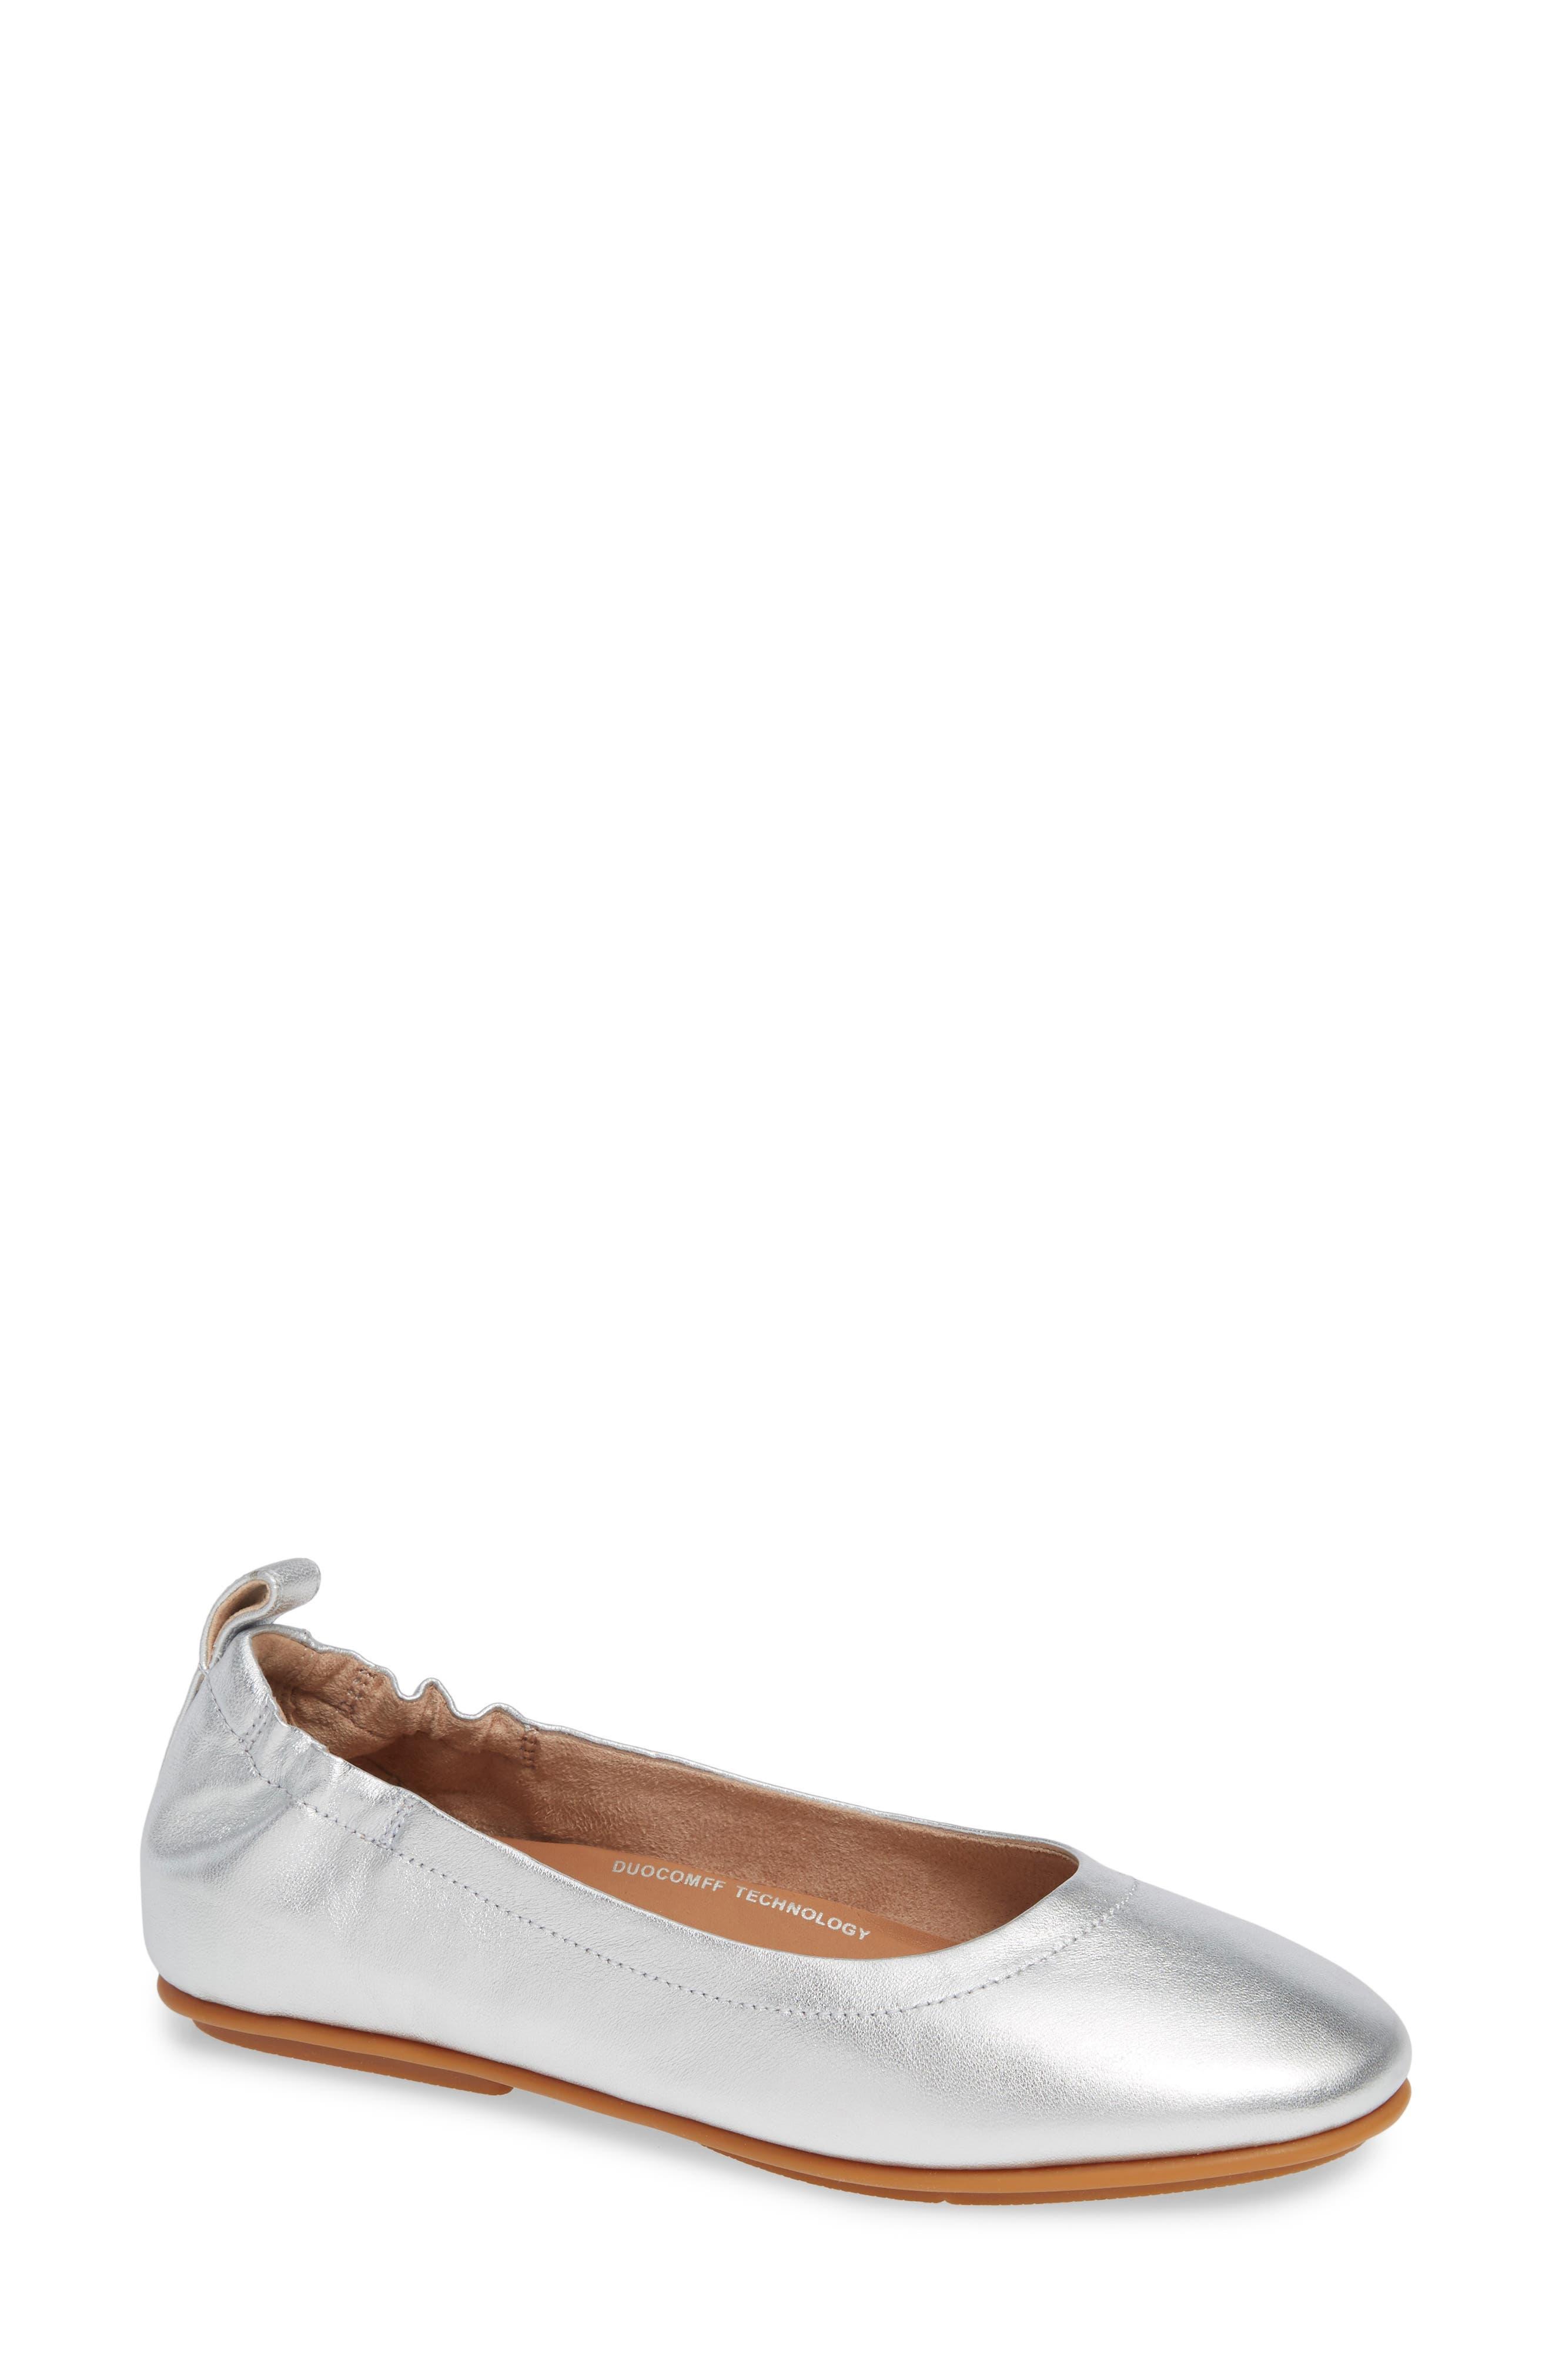 Allegro Ballet Flat